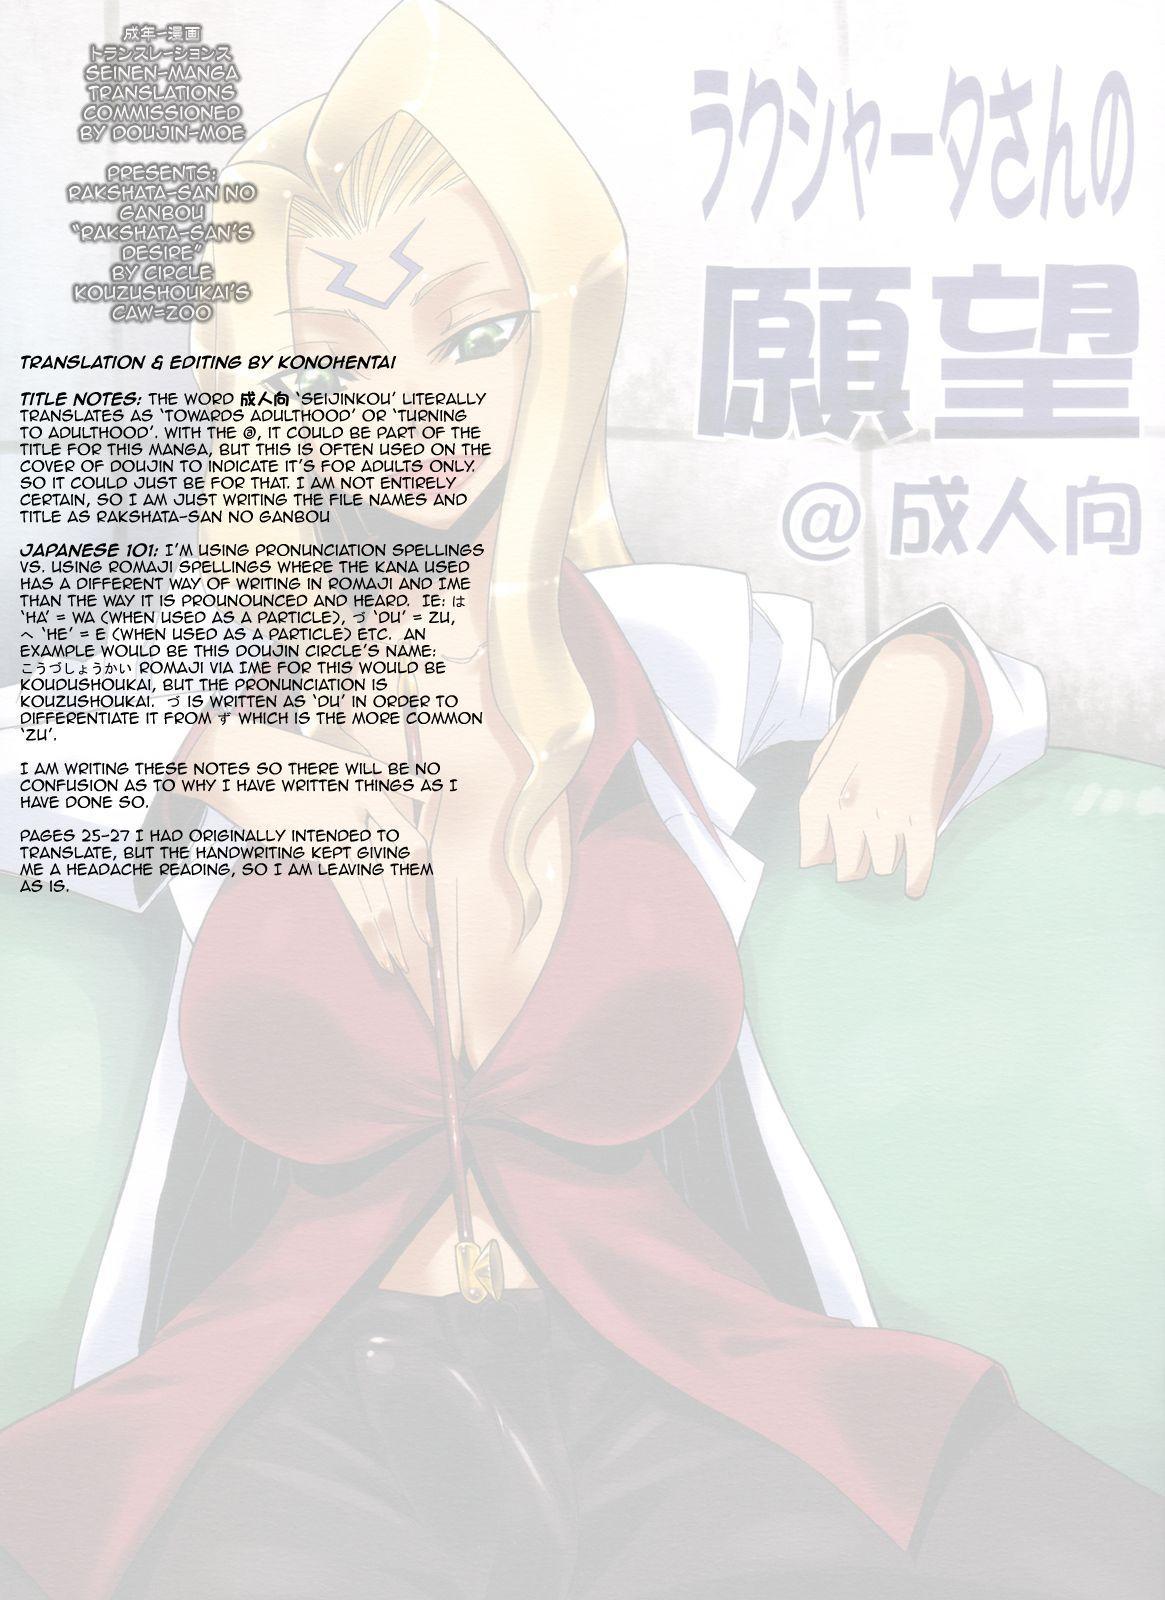 Rakshata-san no Ganbou 2